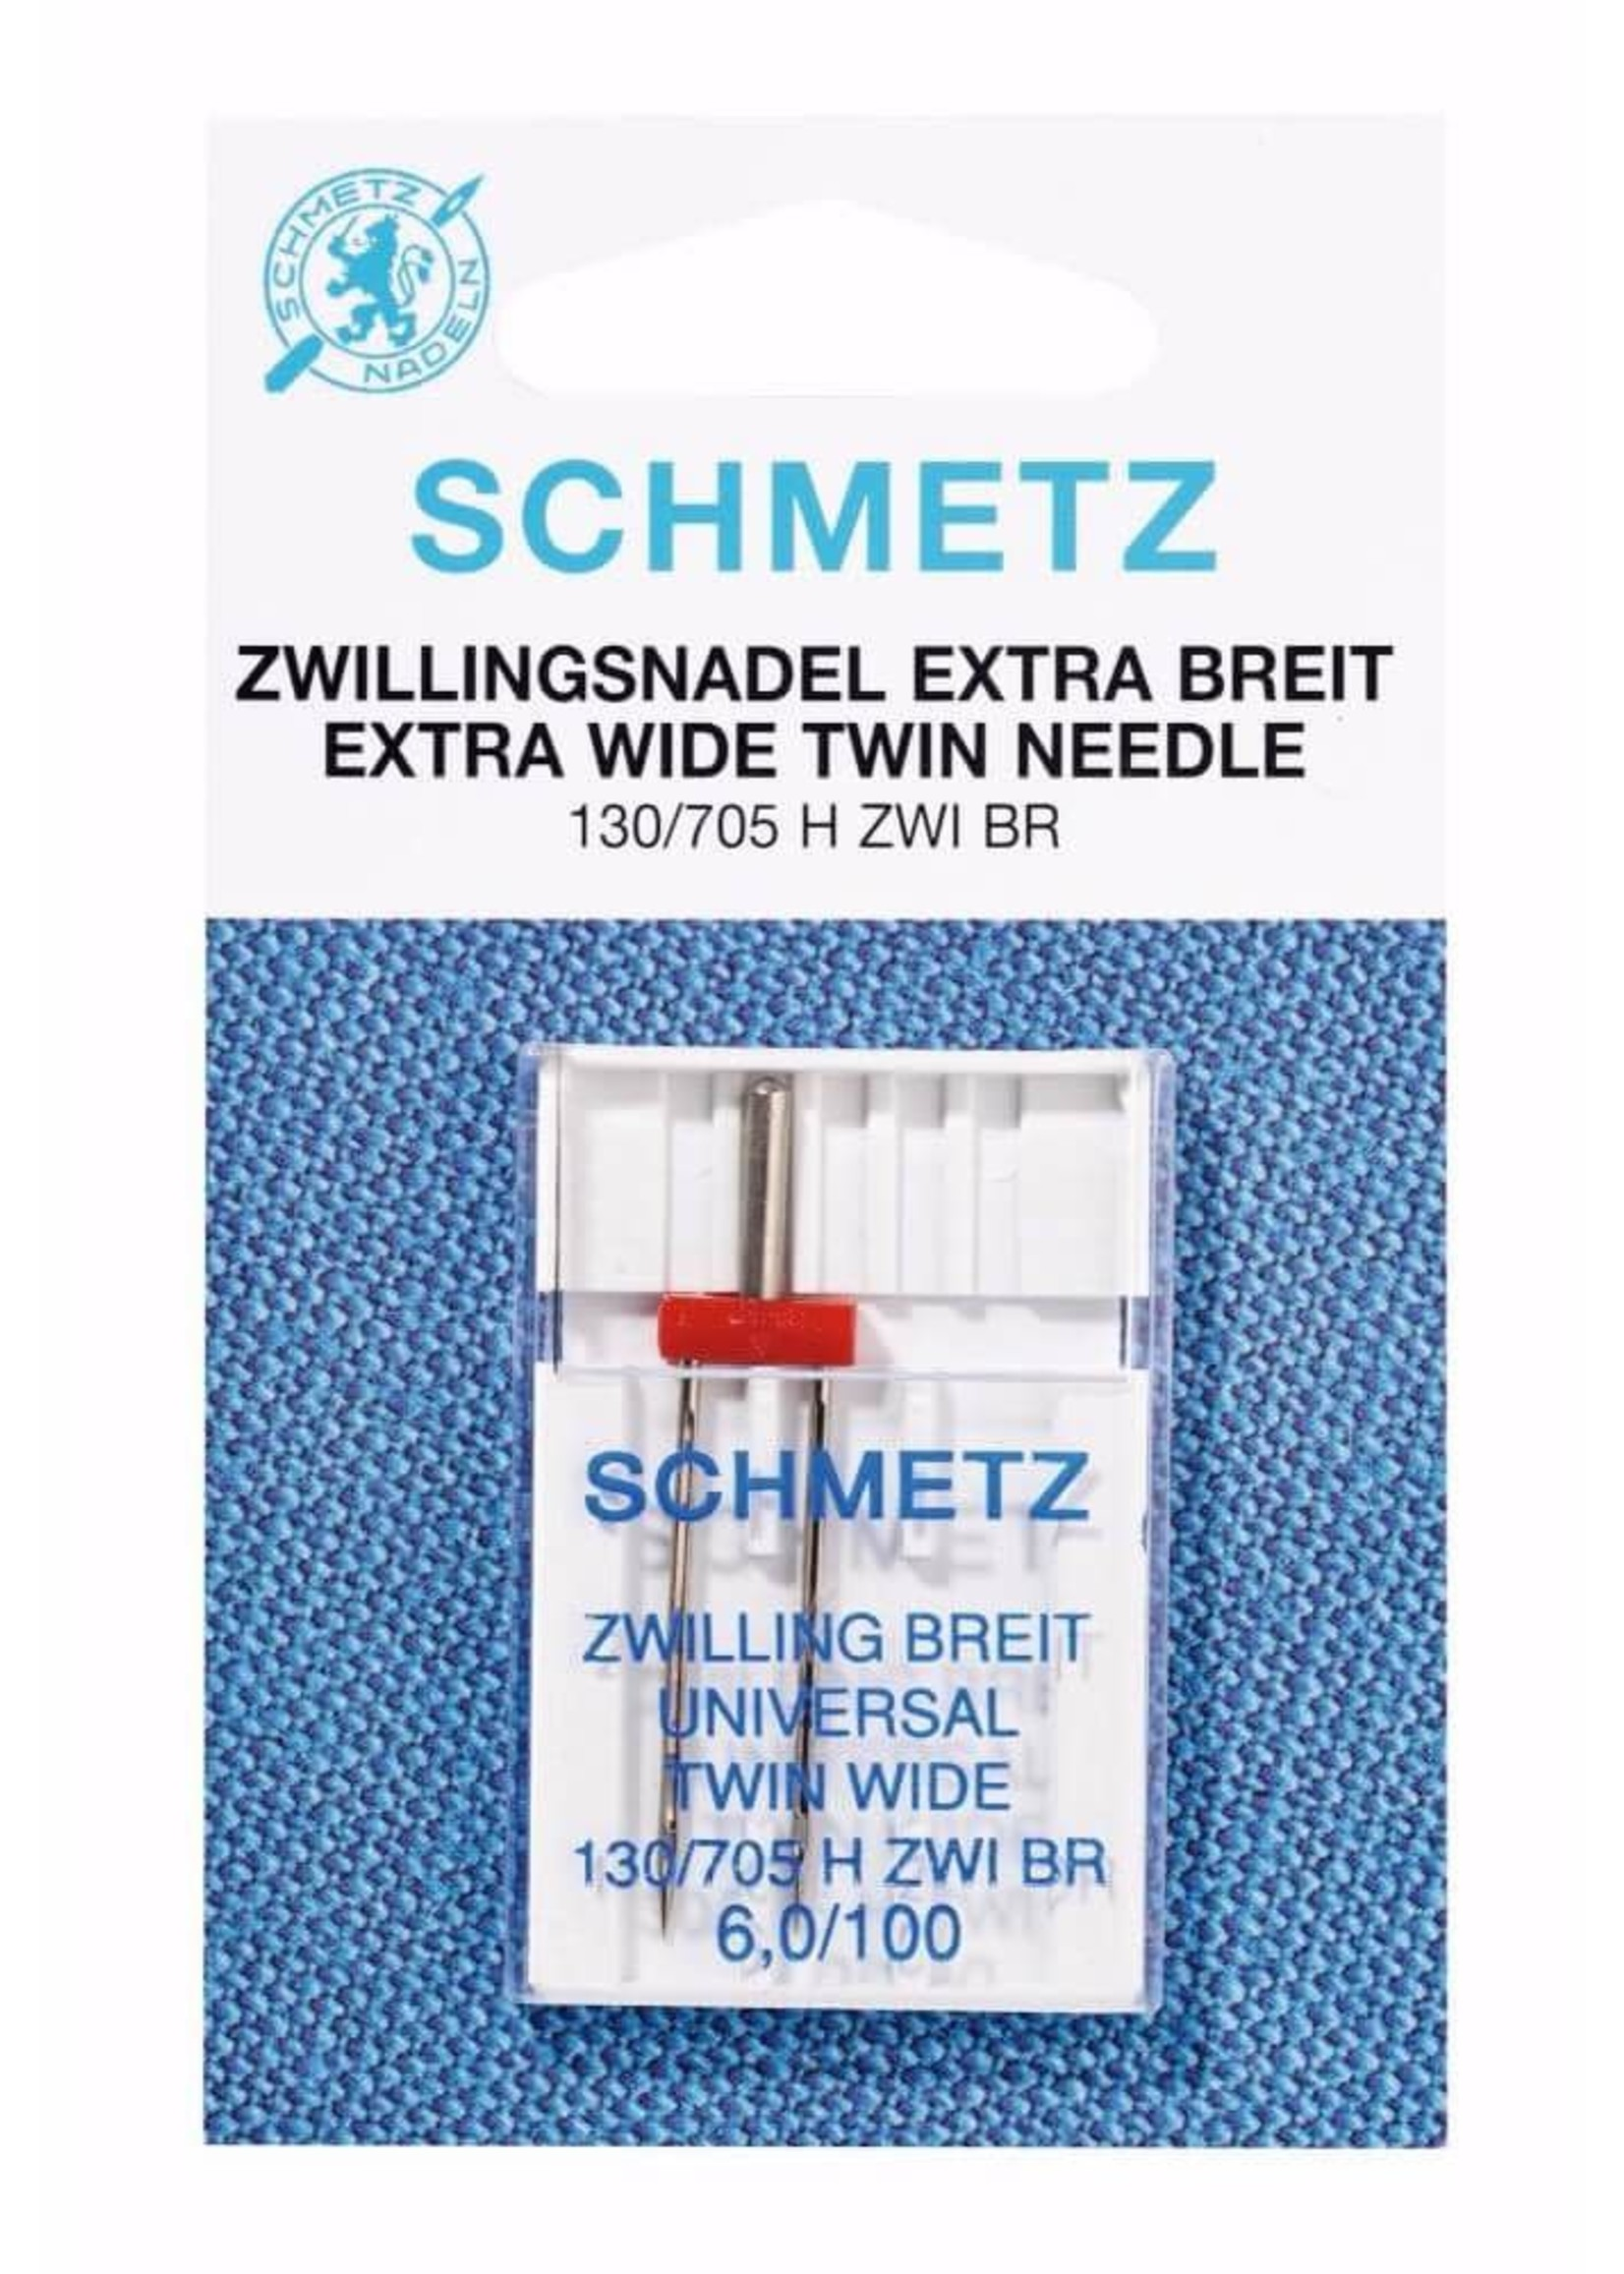 Schmetz Machinenaald Tweeling breed 130/705 H ZWI BR 6,0/100